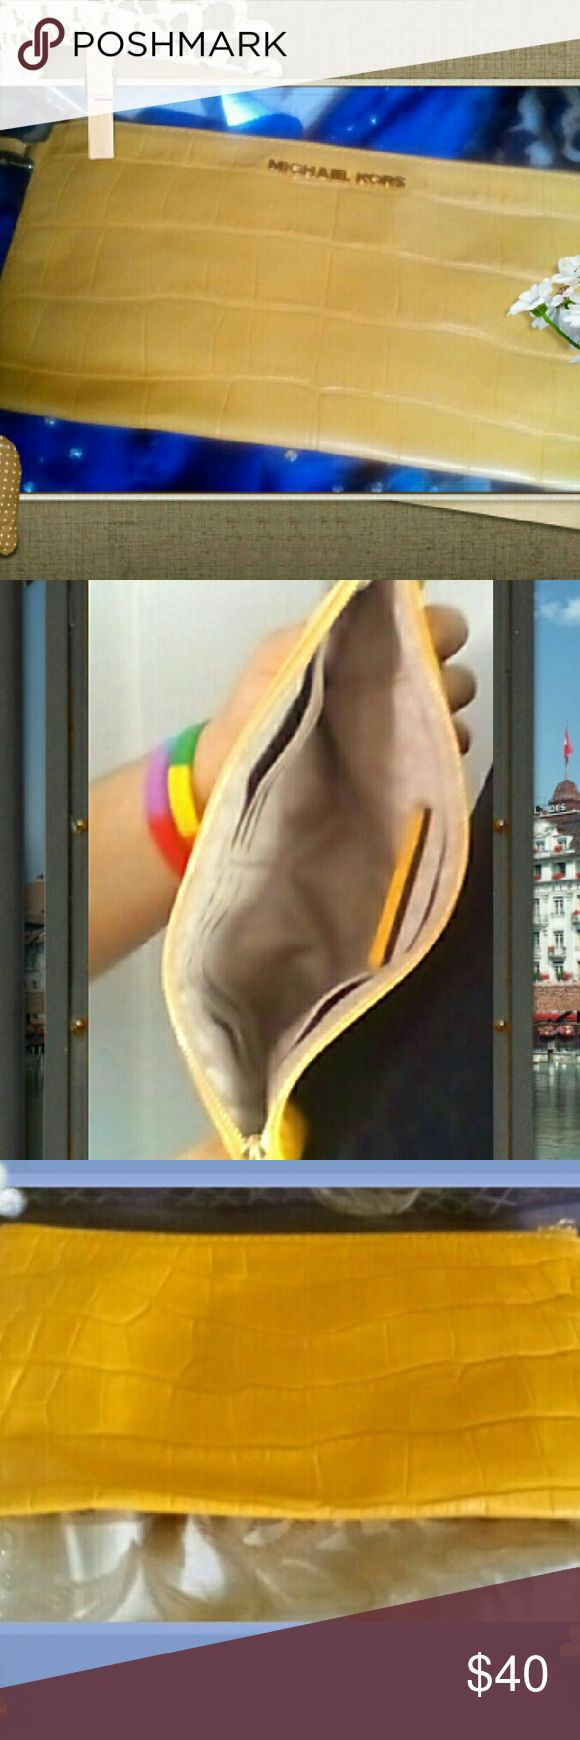 Michael Kors Bags - Michael Kors Bedford Leather Wristlet NWOT   Sale